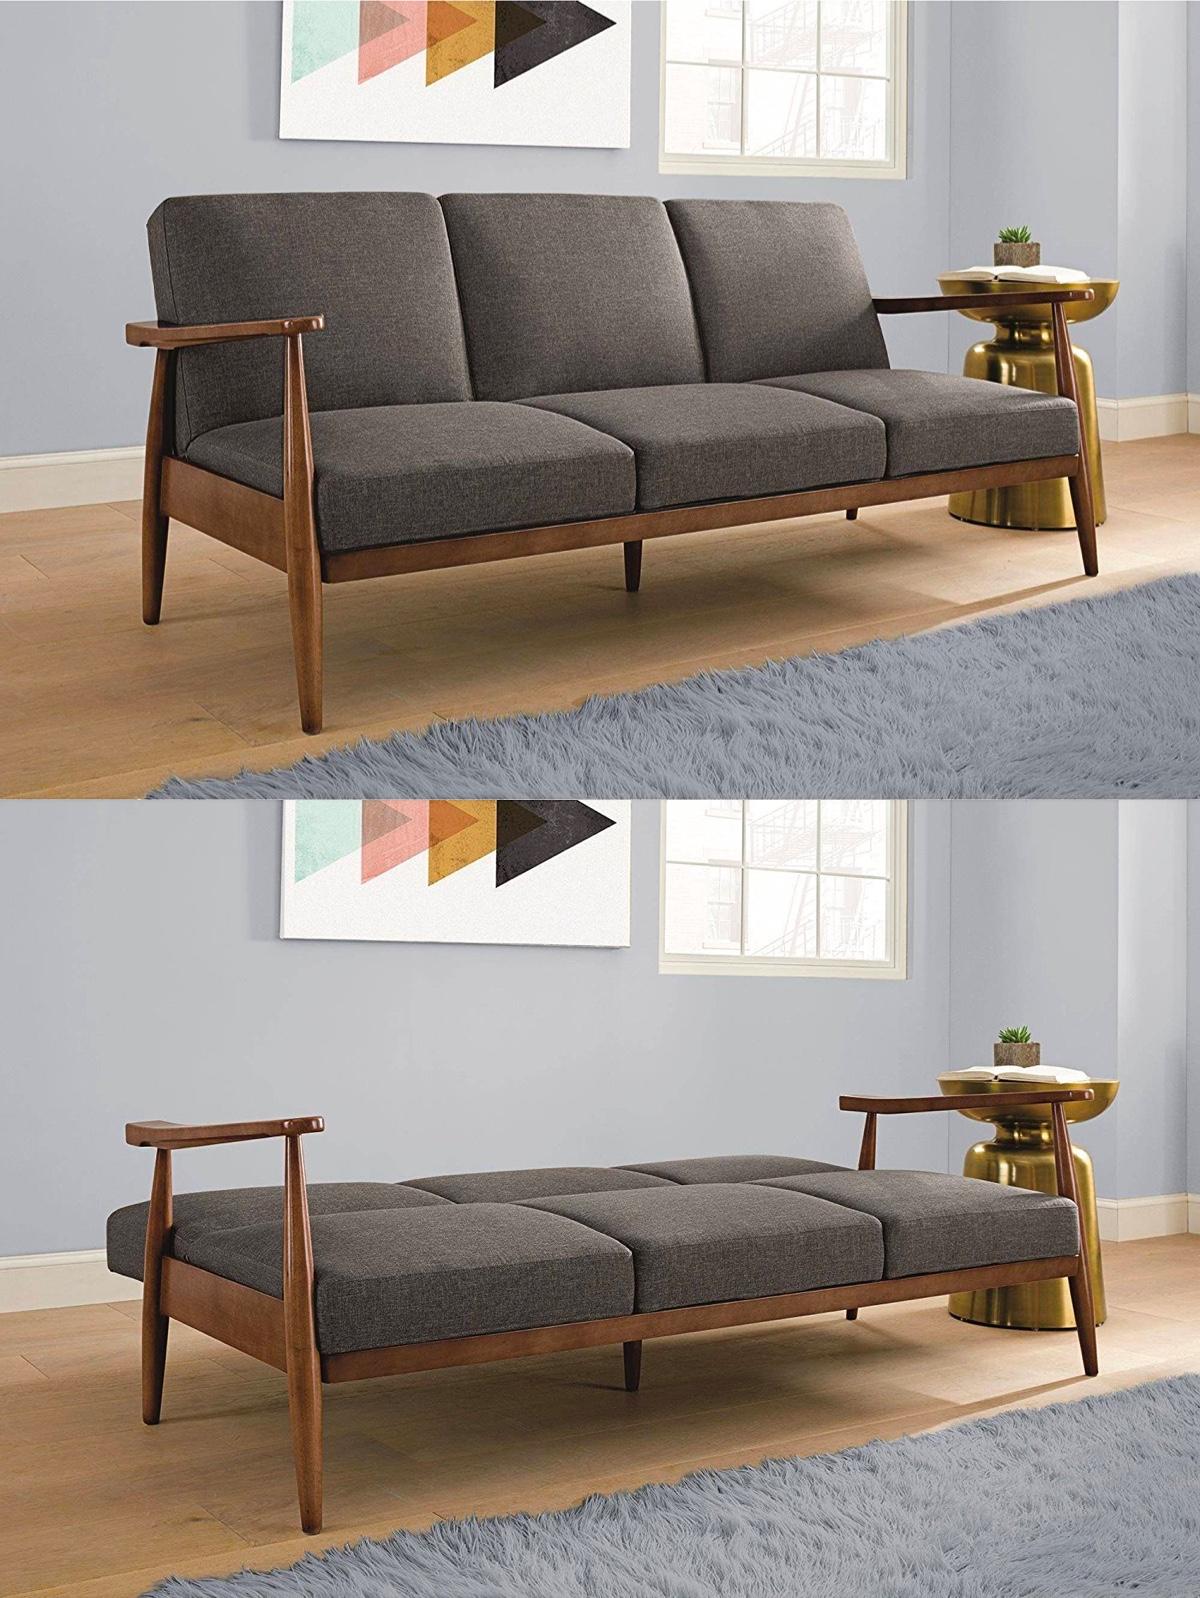 berwick mid century sleeper sofa macy s italsofa sectional 30 modern sofas that make your lounge look the era